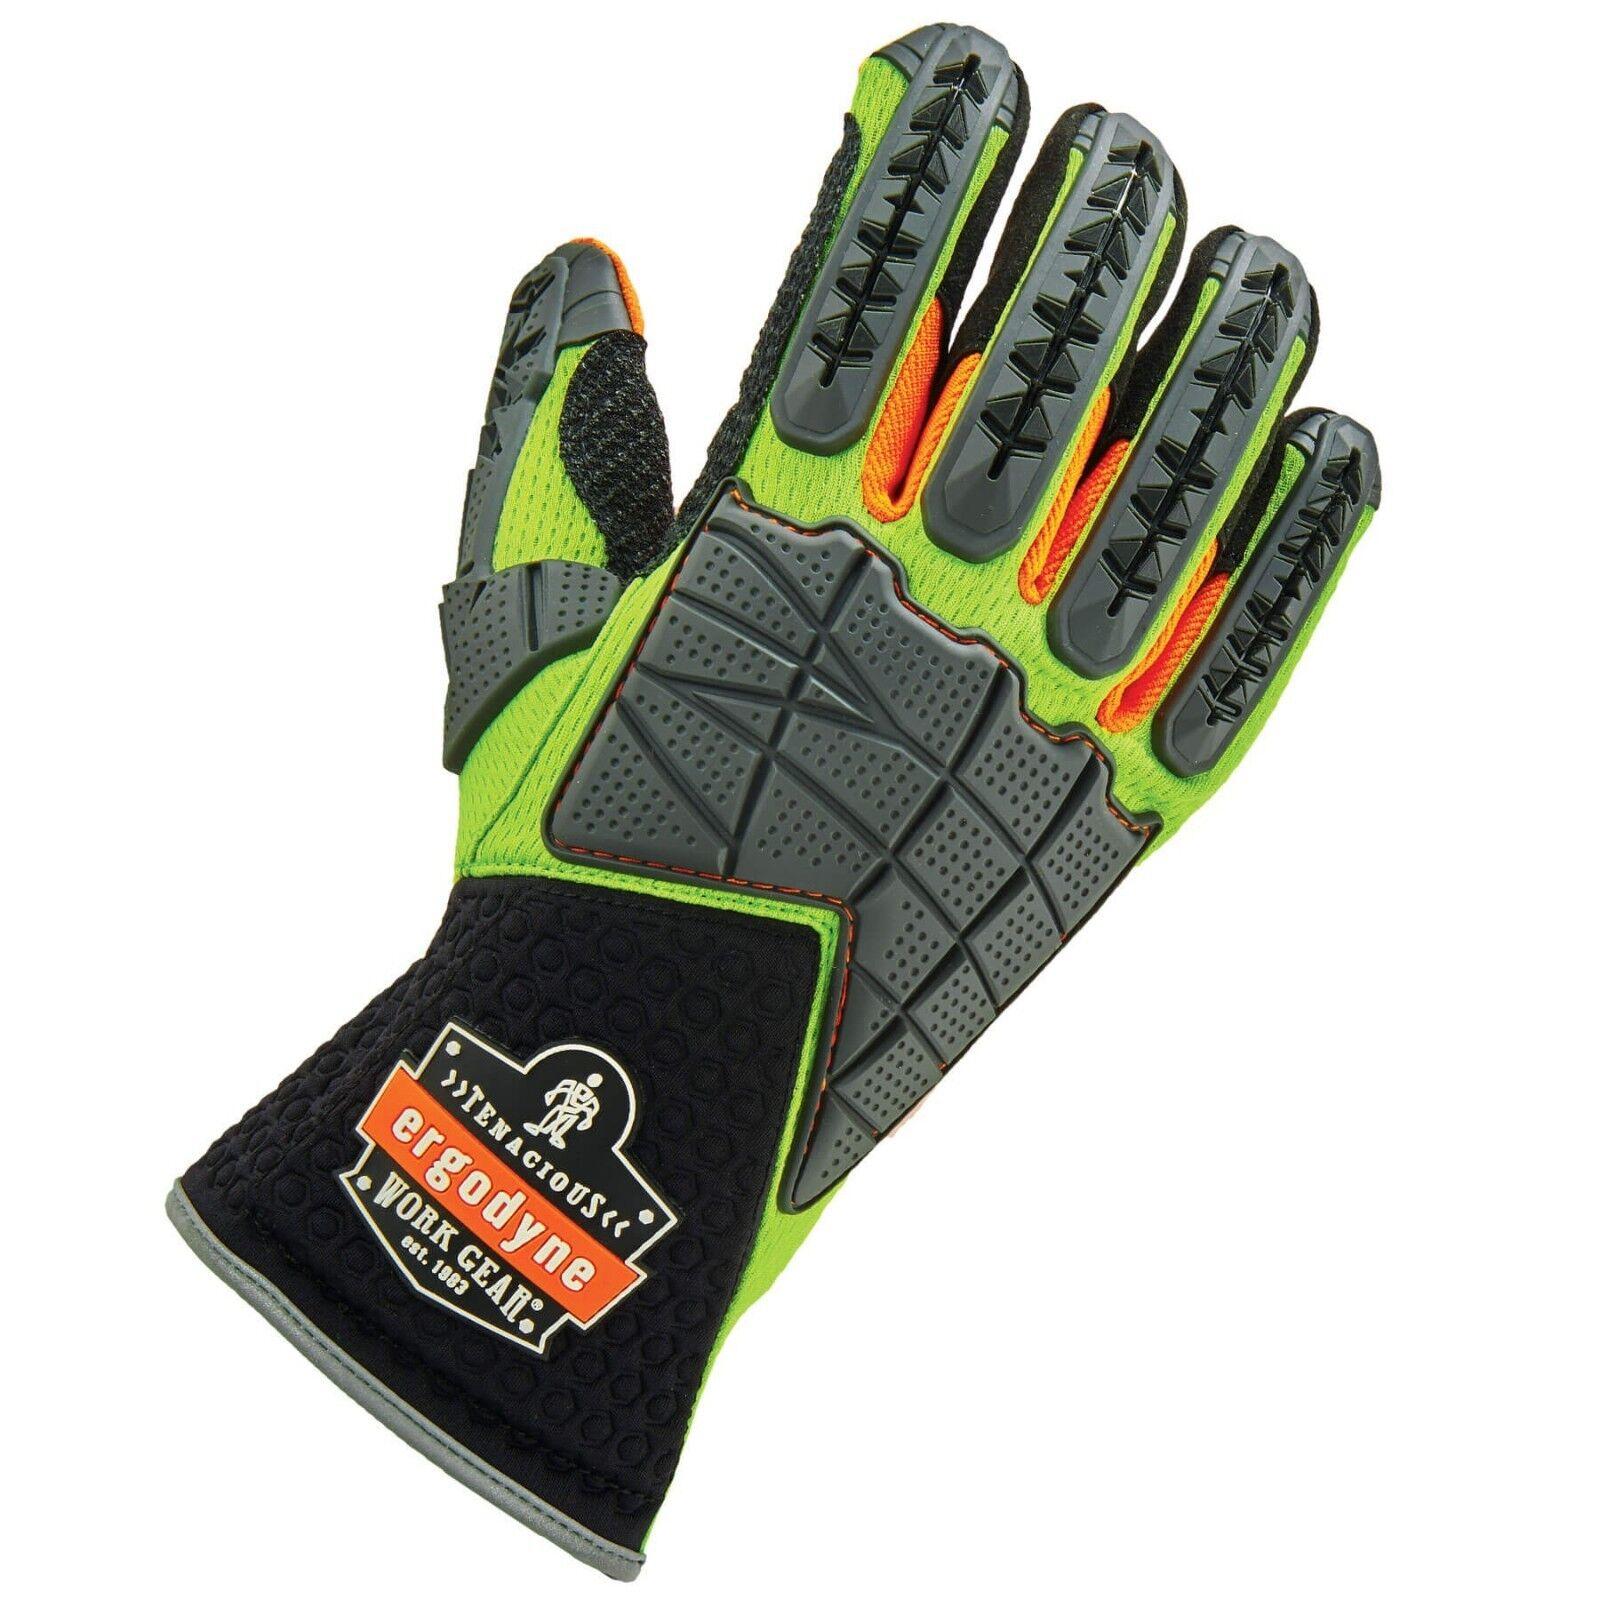 Ergodyne ProFlex 925F(x) Standard Dorsal Impact-Reducing Gloves Size: SM-2XL Business & Industrial